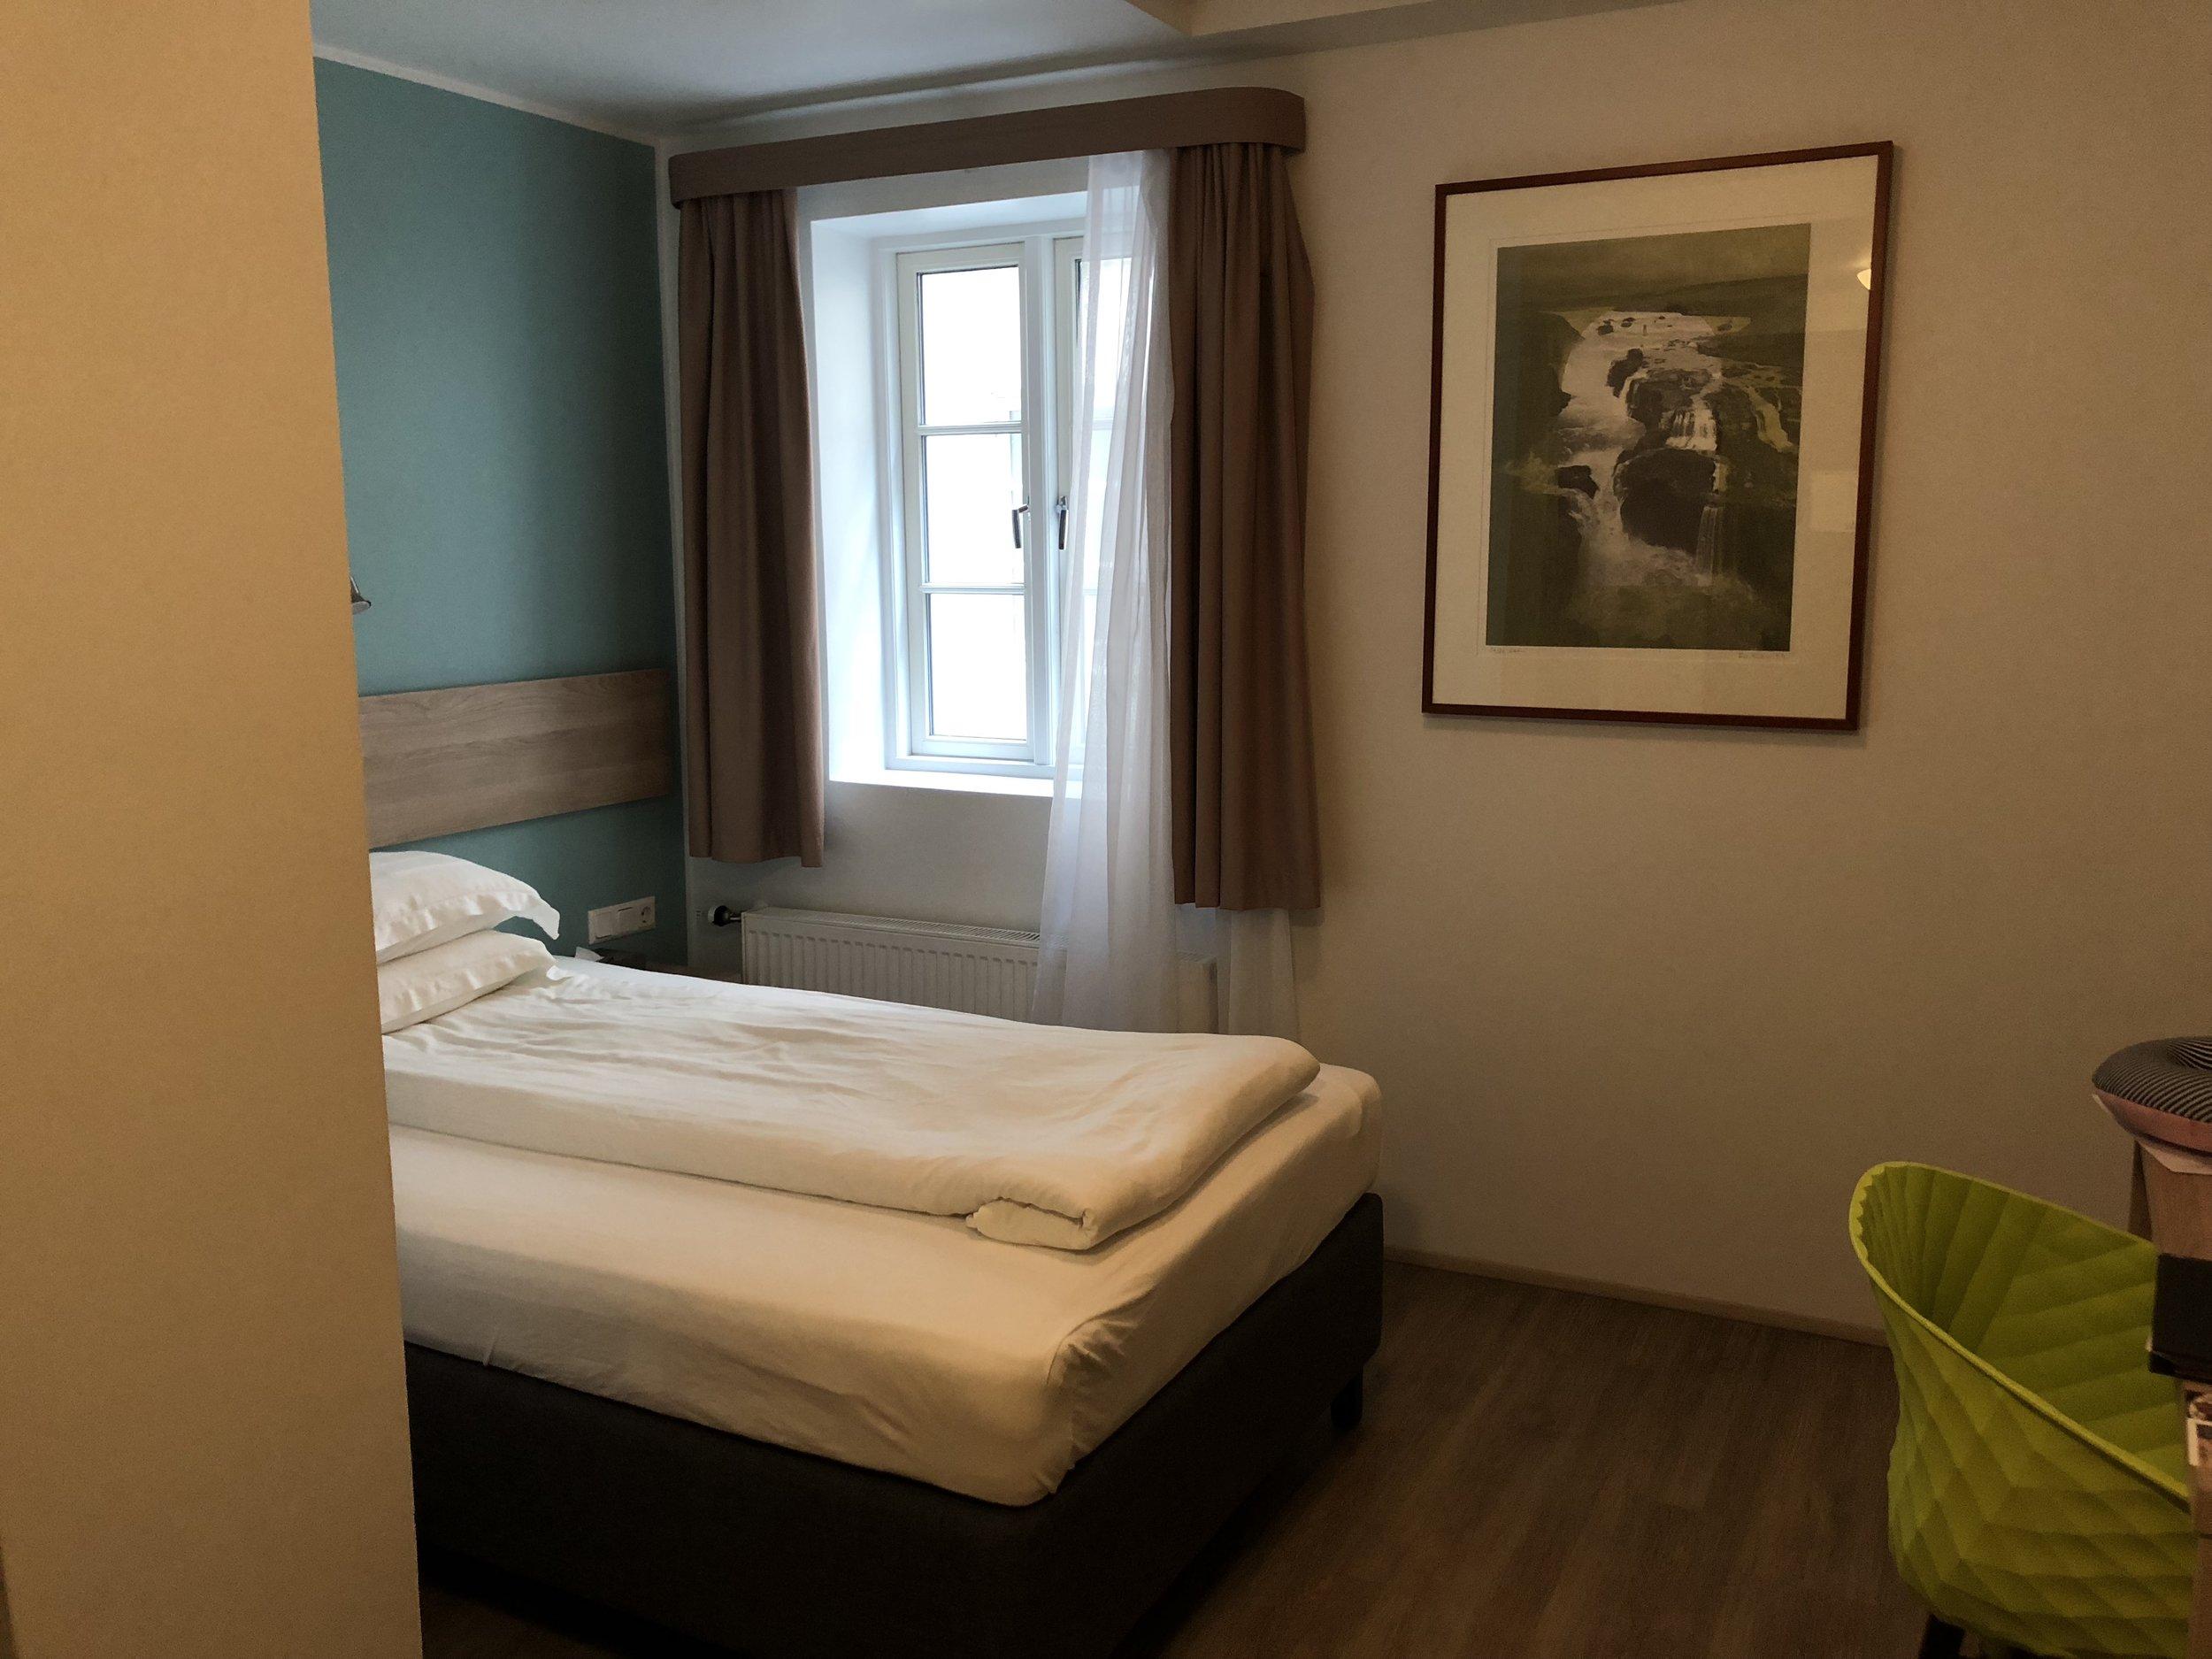 My hotel room at CenterPlaza Hotel